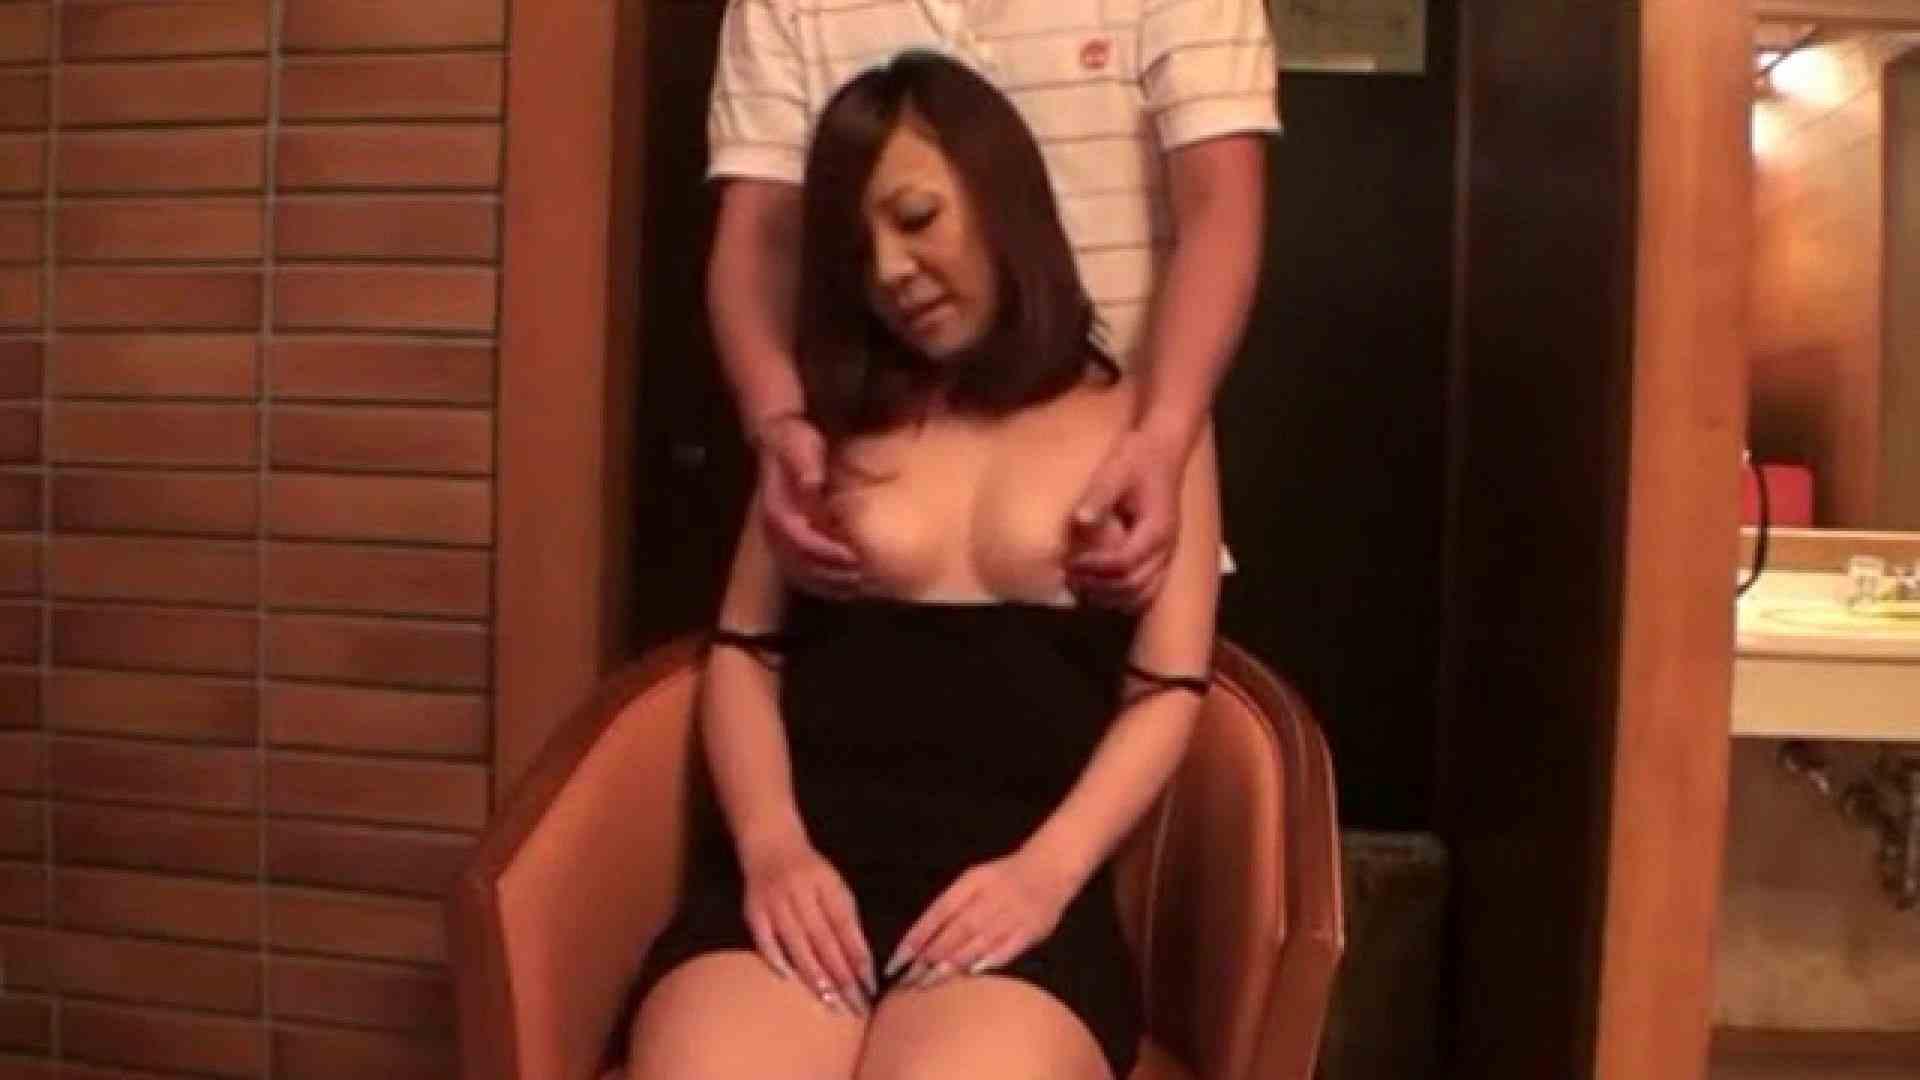 S級厳選美女ビッチガールVol.10 むっちり   美女  80連発 1